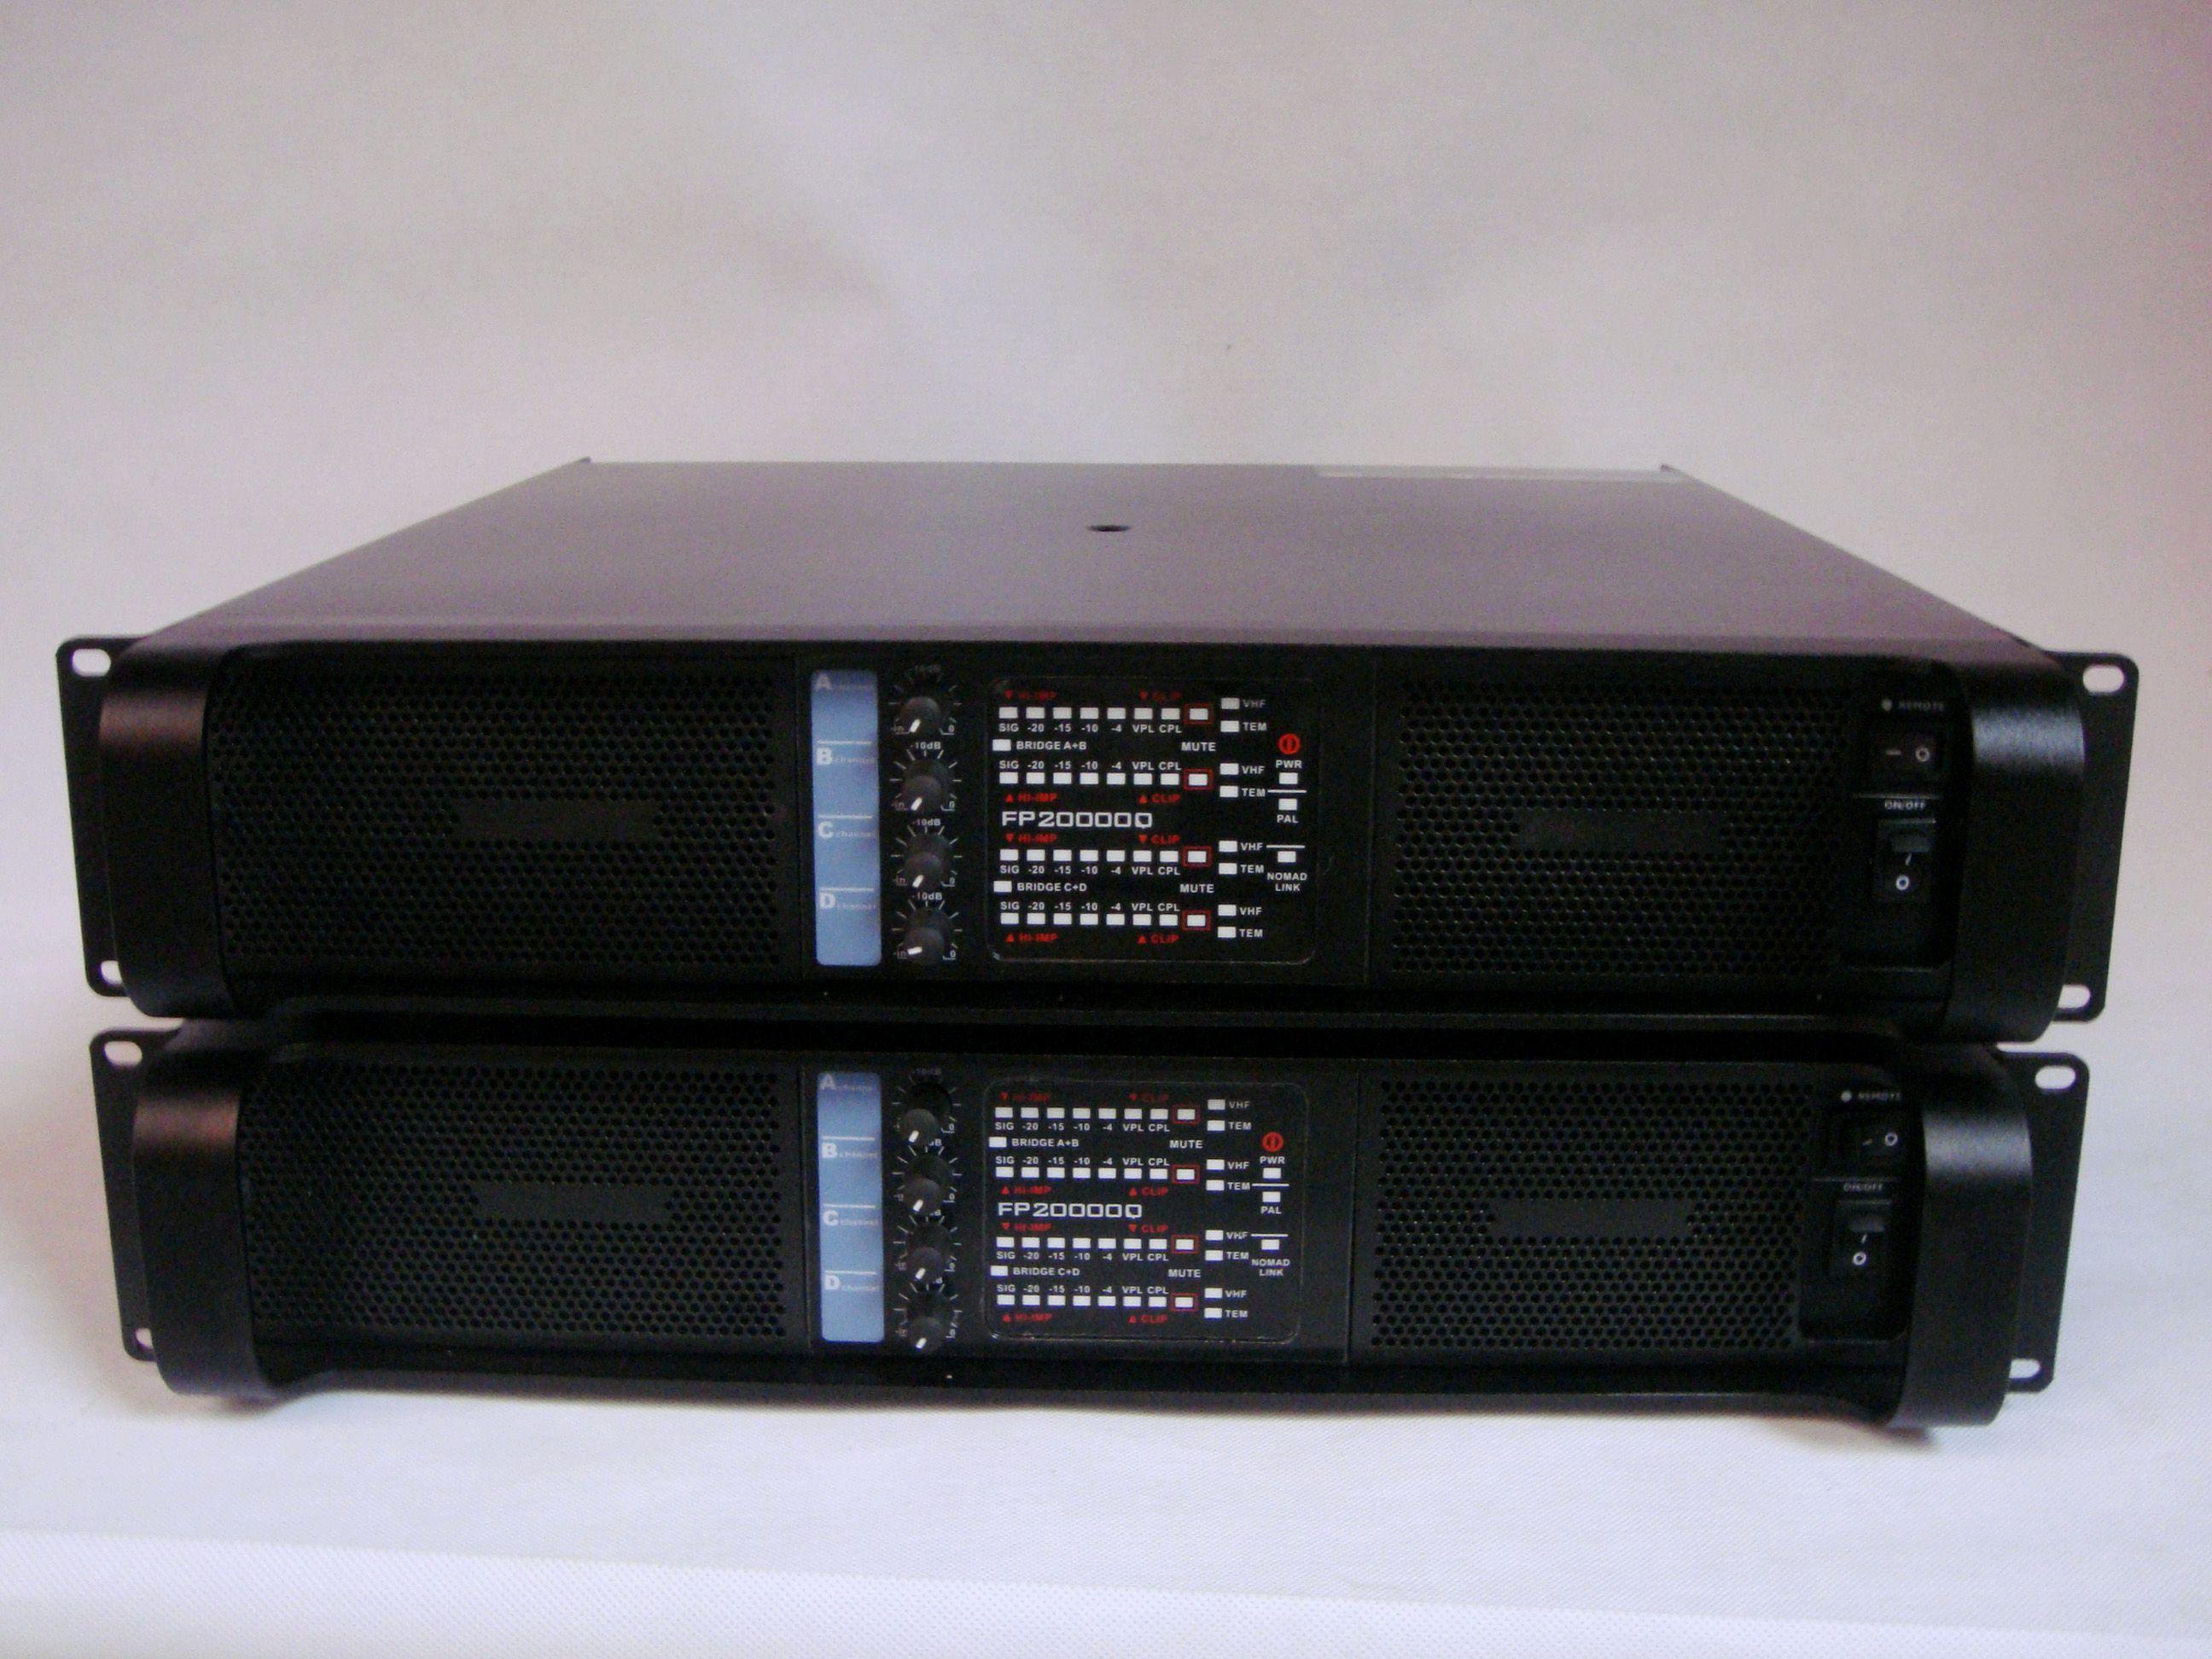 professional power amplifier amp fp20000q gruppen subwoofer amplifier professional 4 2200w lab. Black Bedroom Furniture Sets. Home Design Ideas